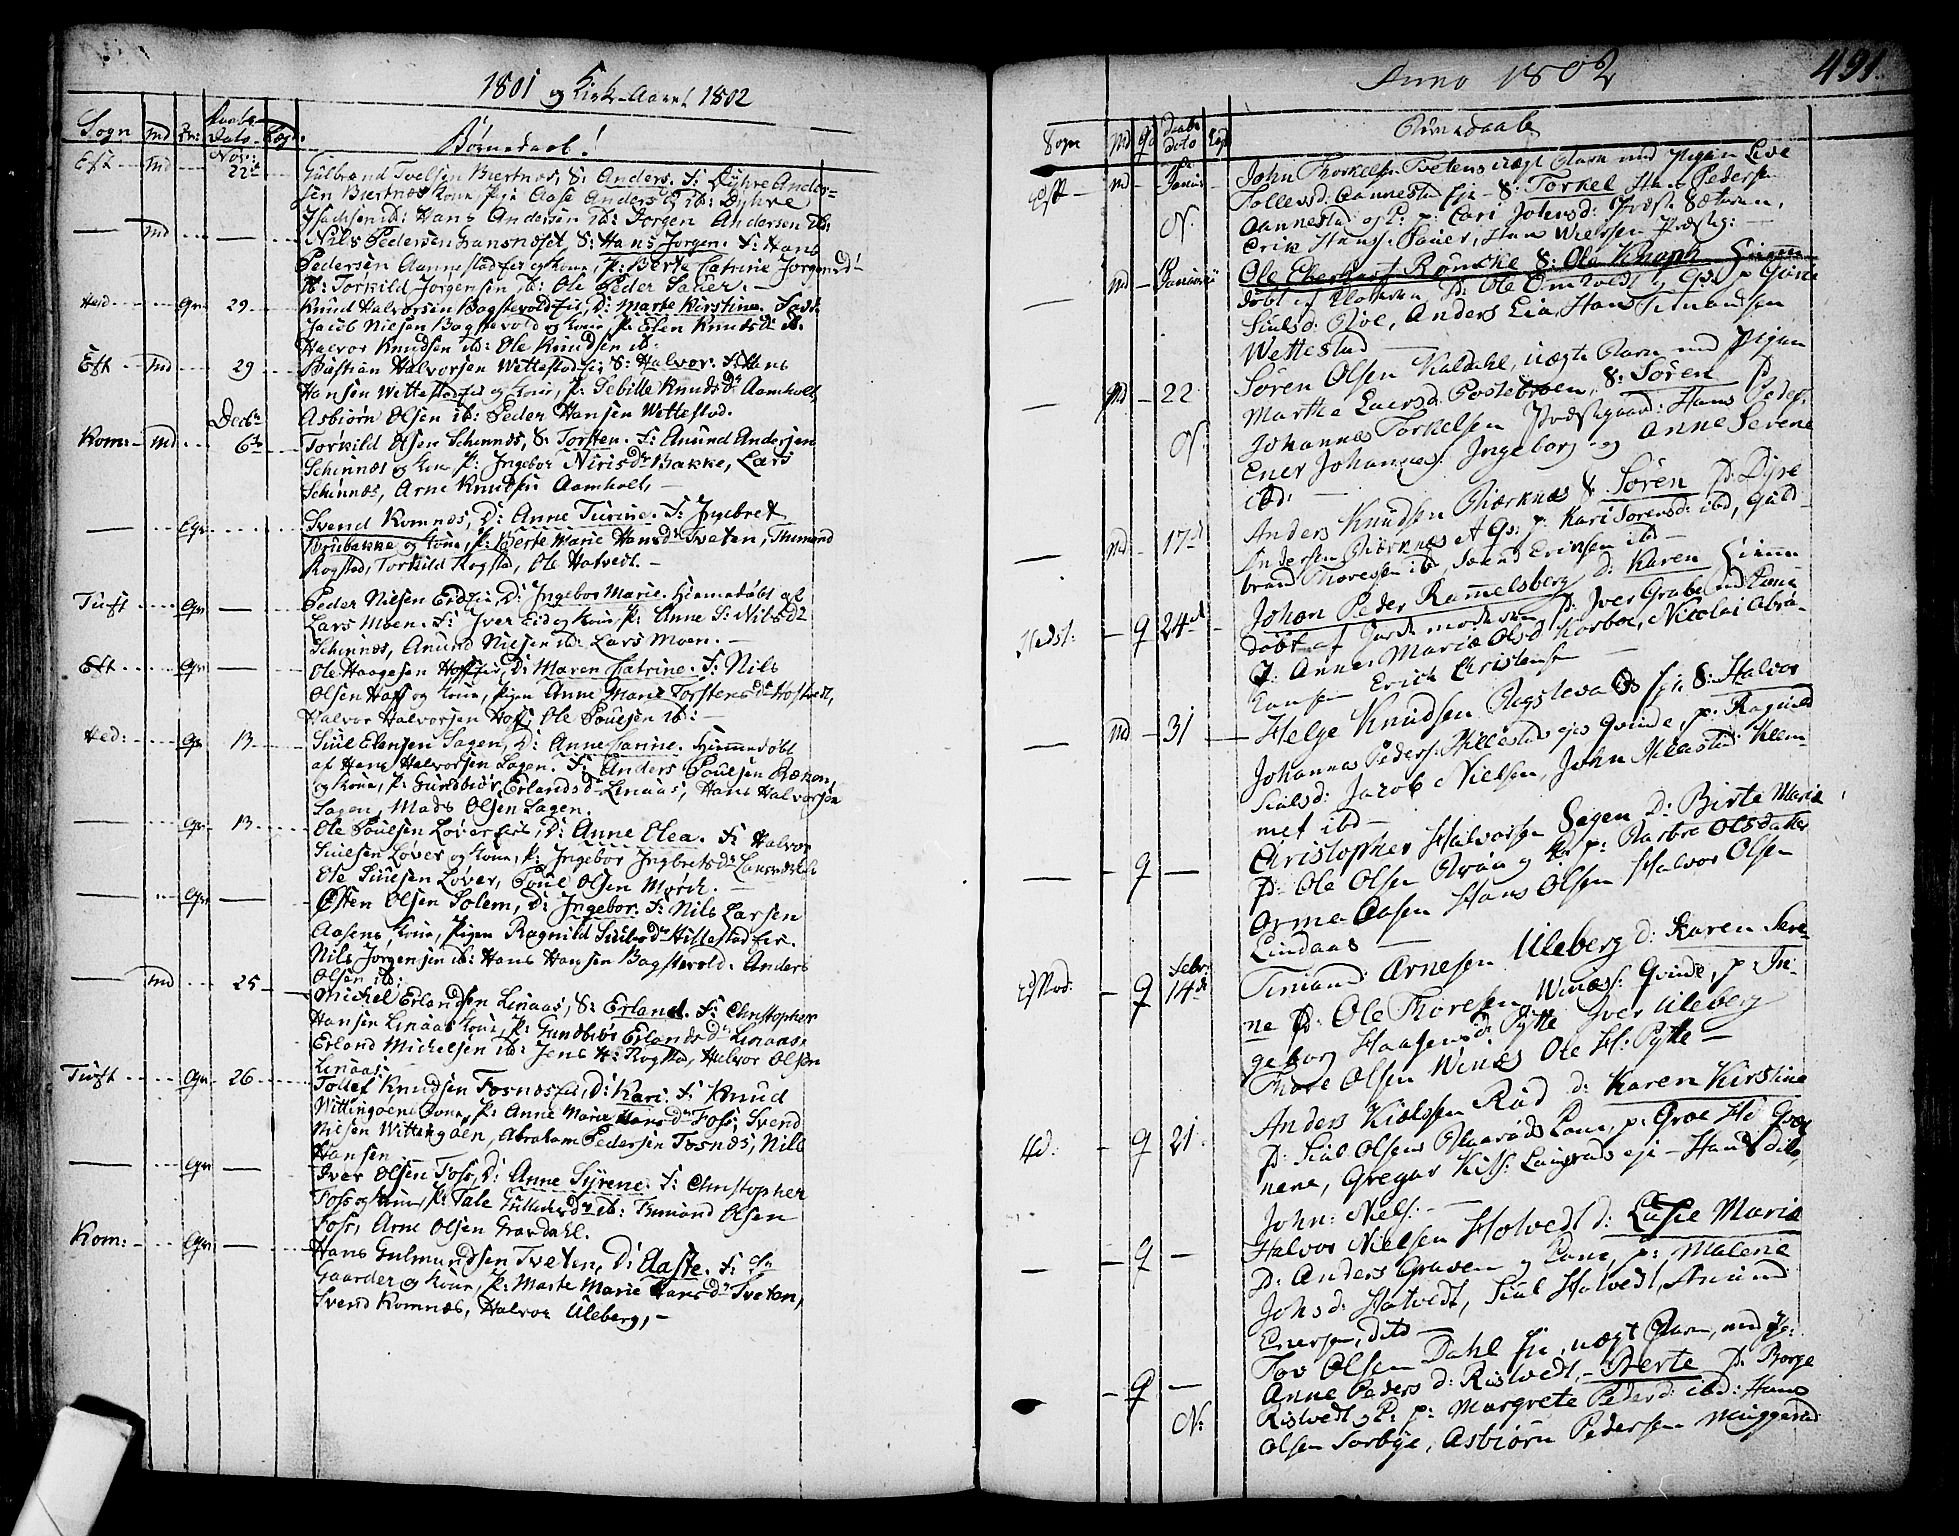 SAKO, Sandsvær kirkebøker, F/Fa/L0002a: Ministerialbok nr. I 2, 1725-1809, s. 491